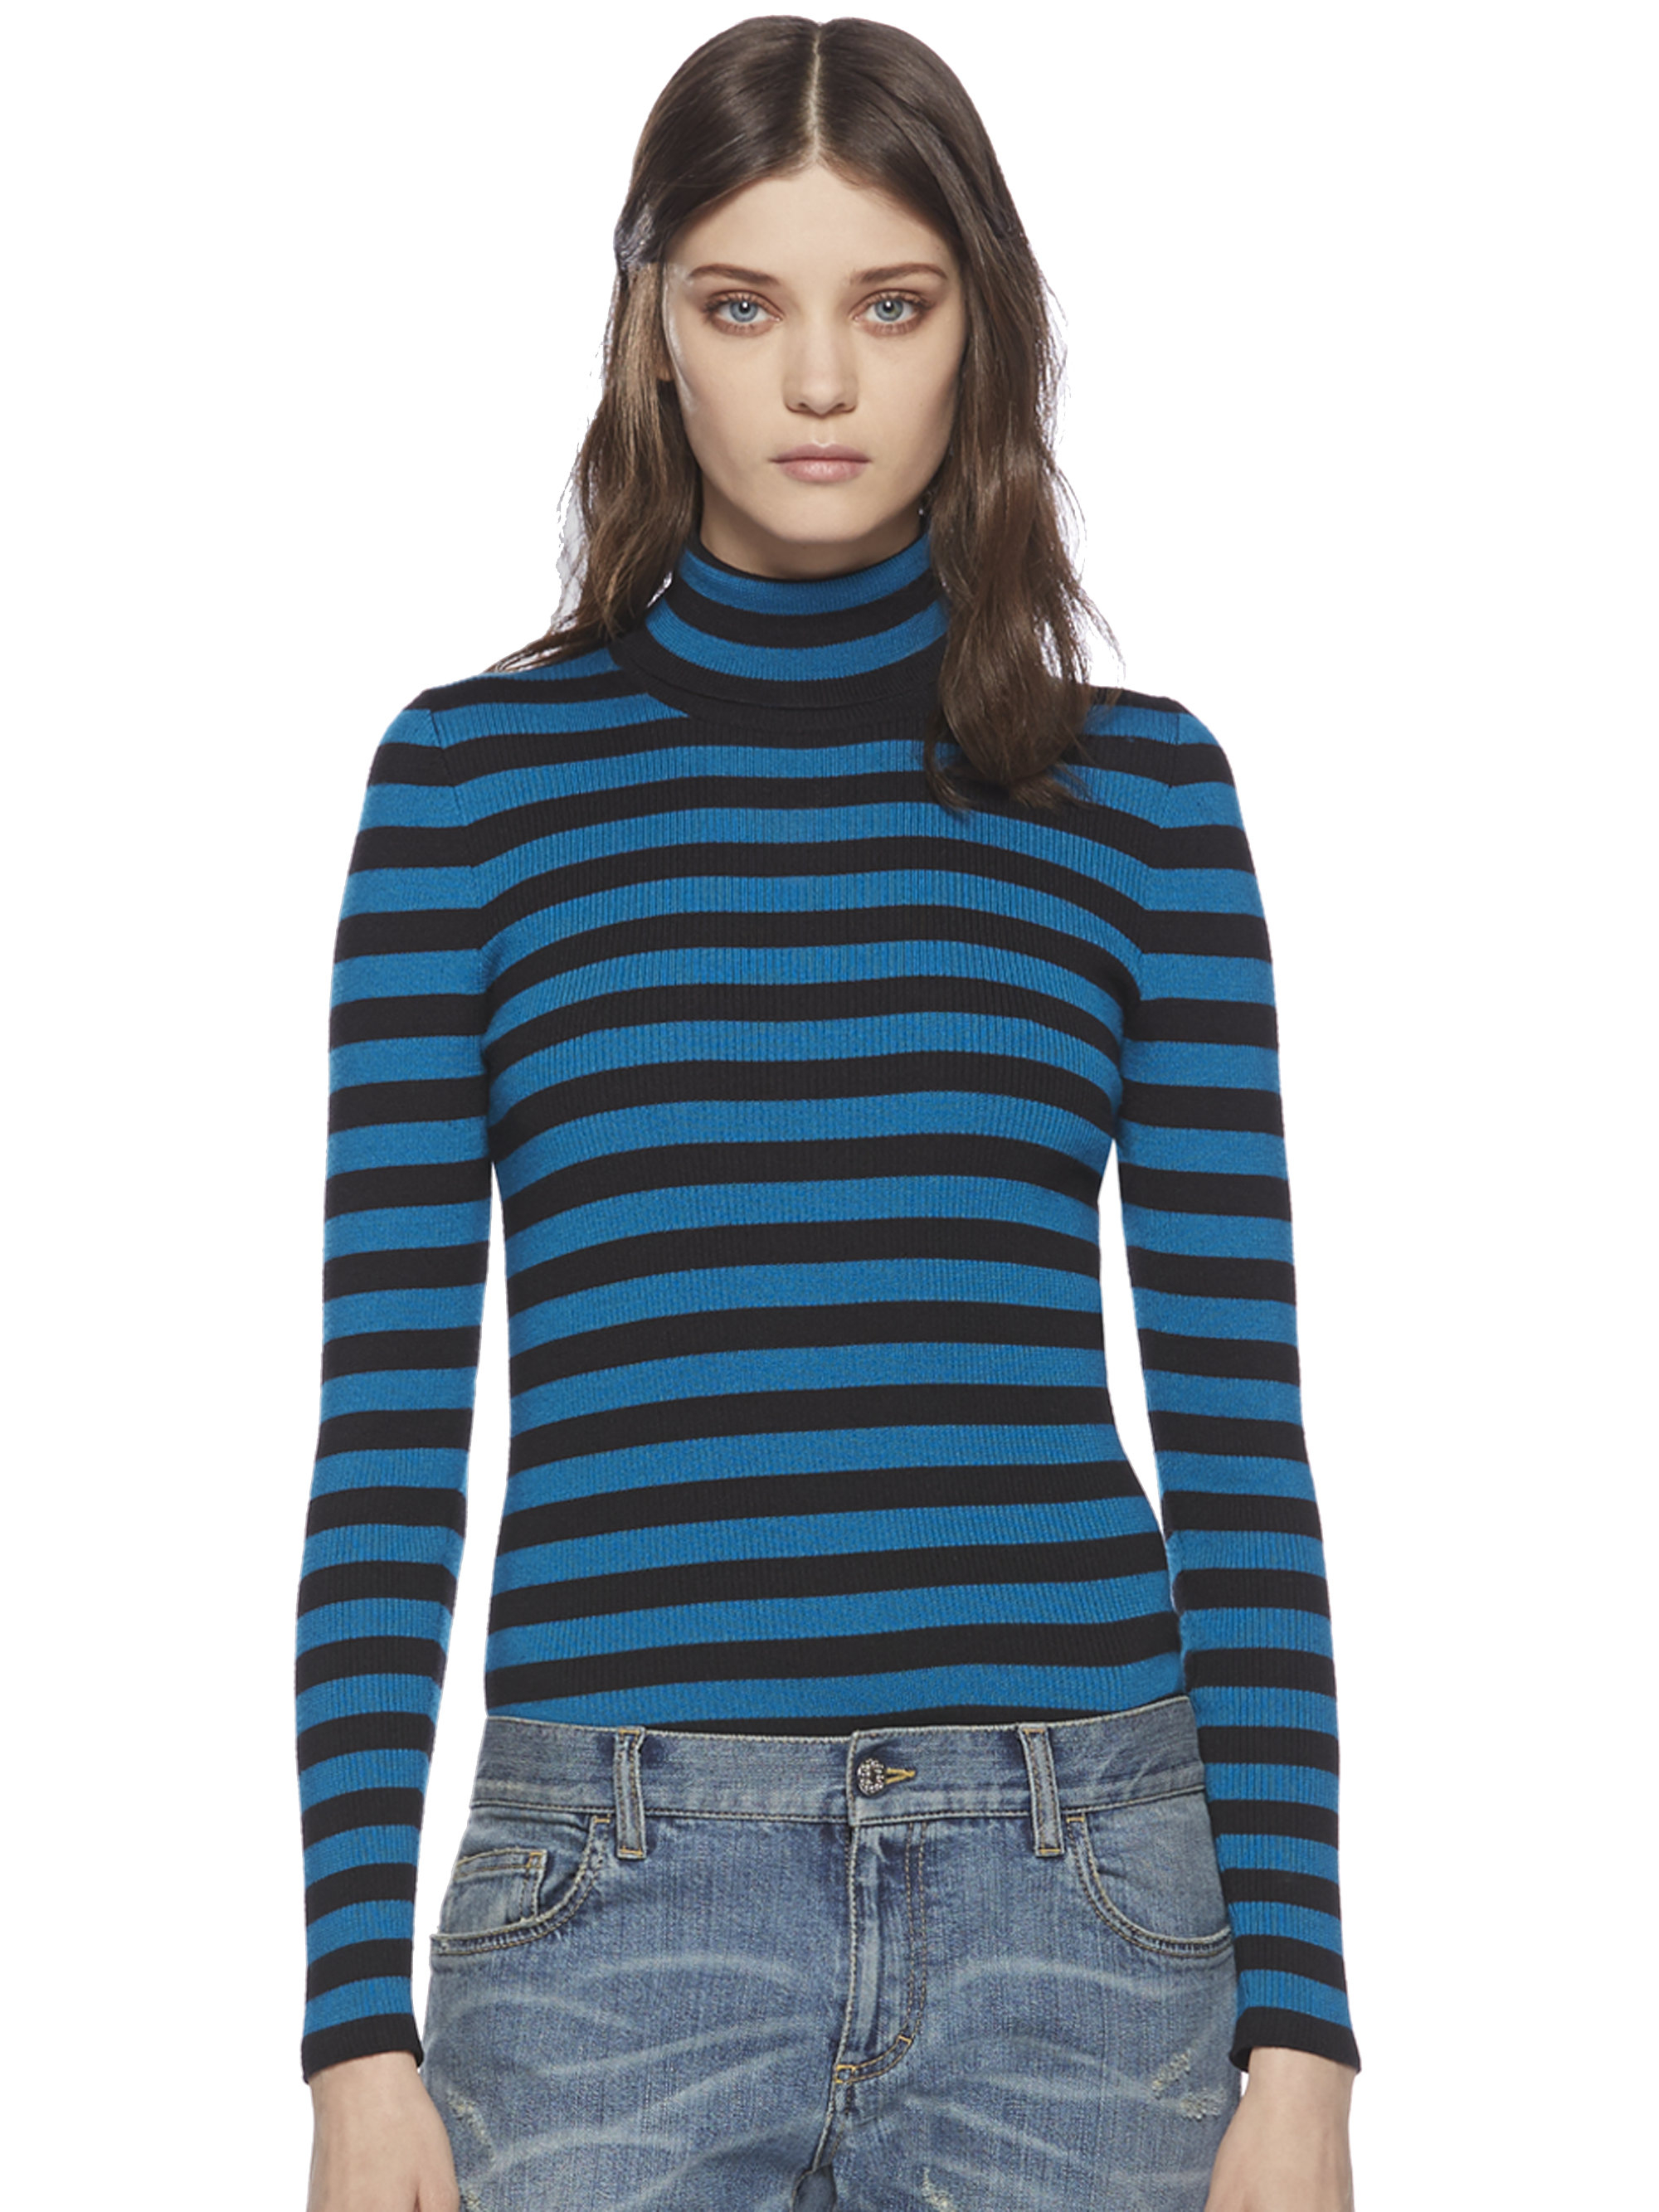 Gucci Striped Silk & Cashmere Turtleneck Sweater in Blue | Lyst